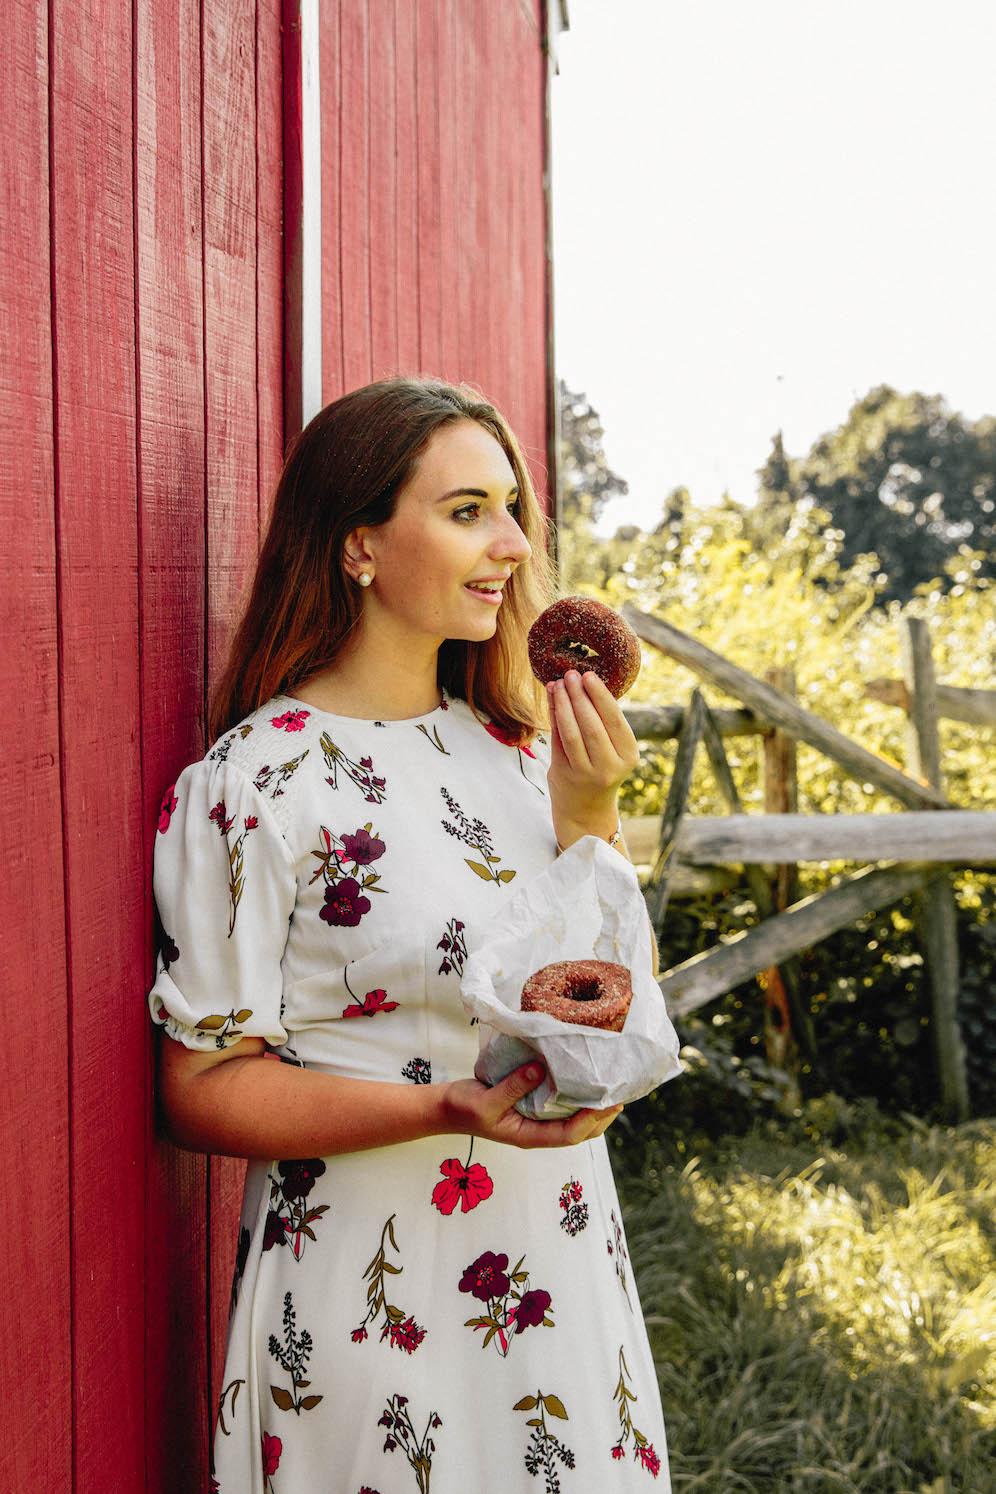 Apple-Picking-in-Fairfield-County-Connecticut-The-Coastal-Confidence-by-Aubrey-Yandow-0812.jpg